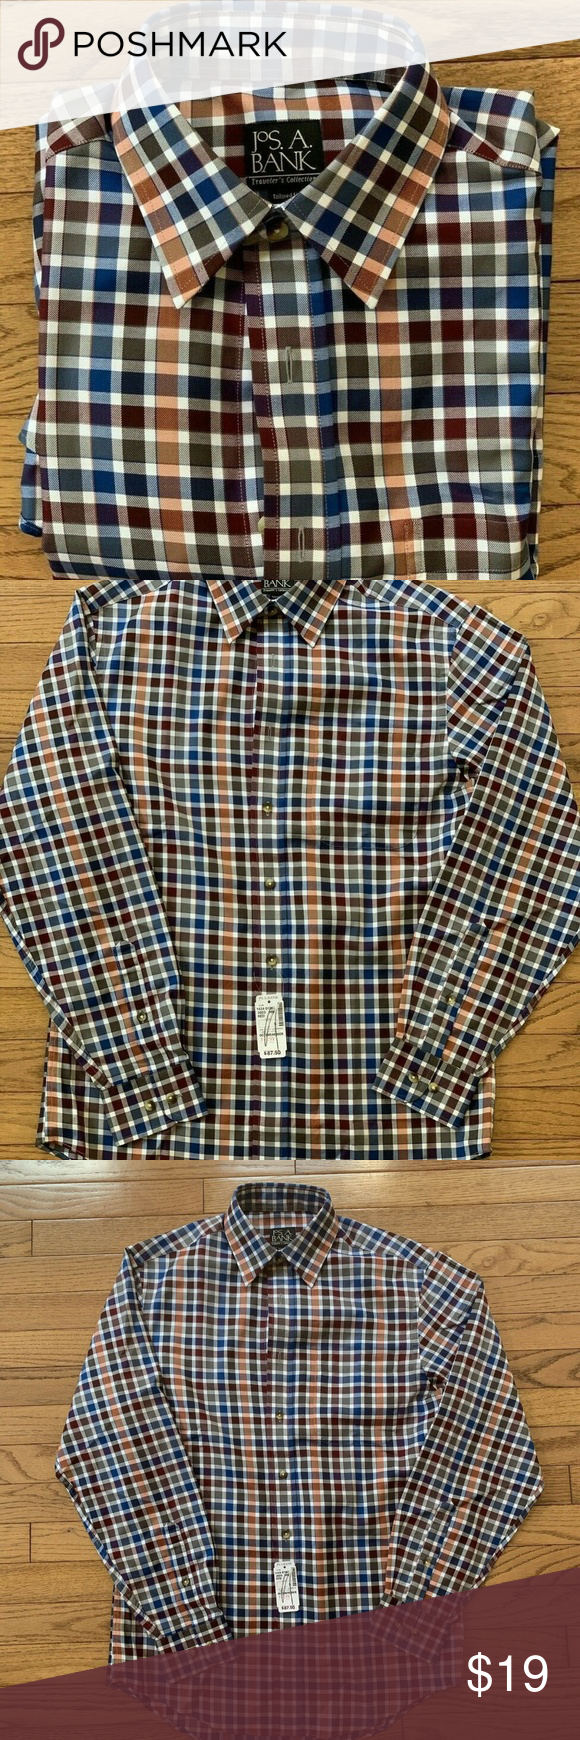 Jos A Bank Travelers Collection Men's Dress Shirt Mens